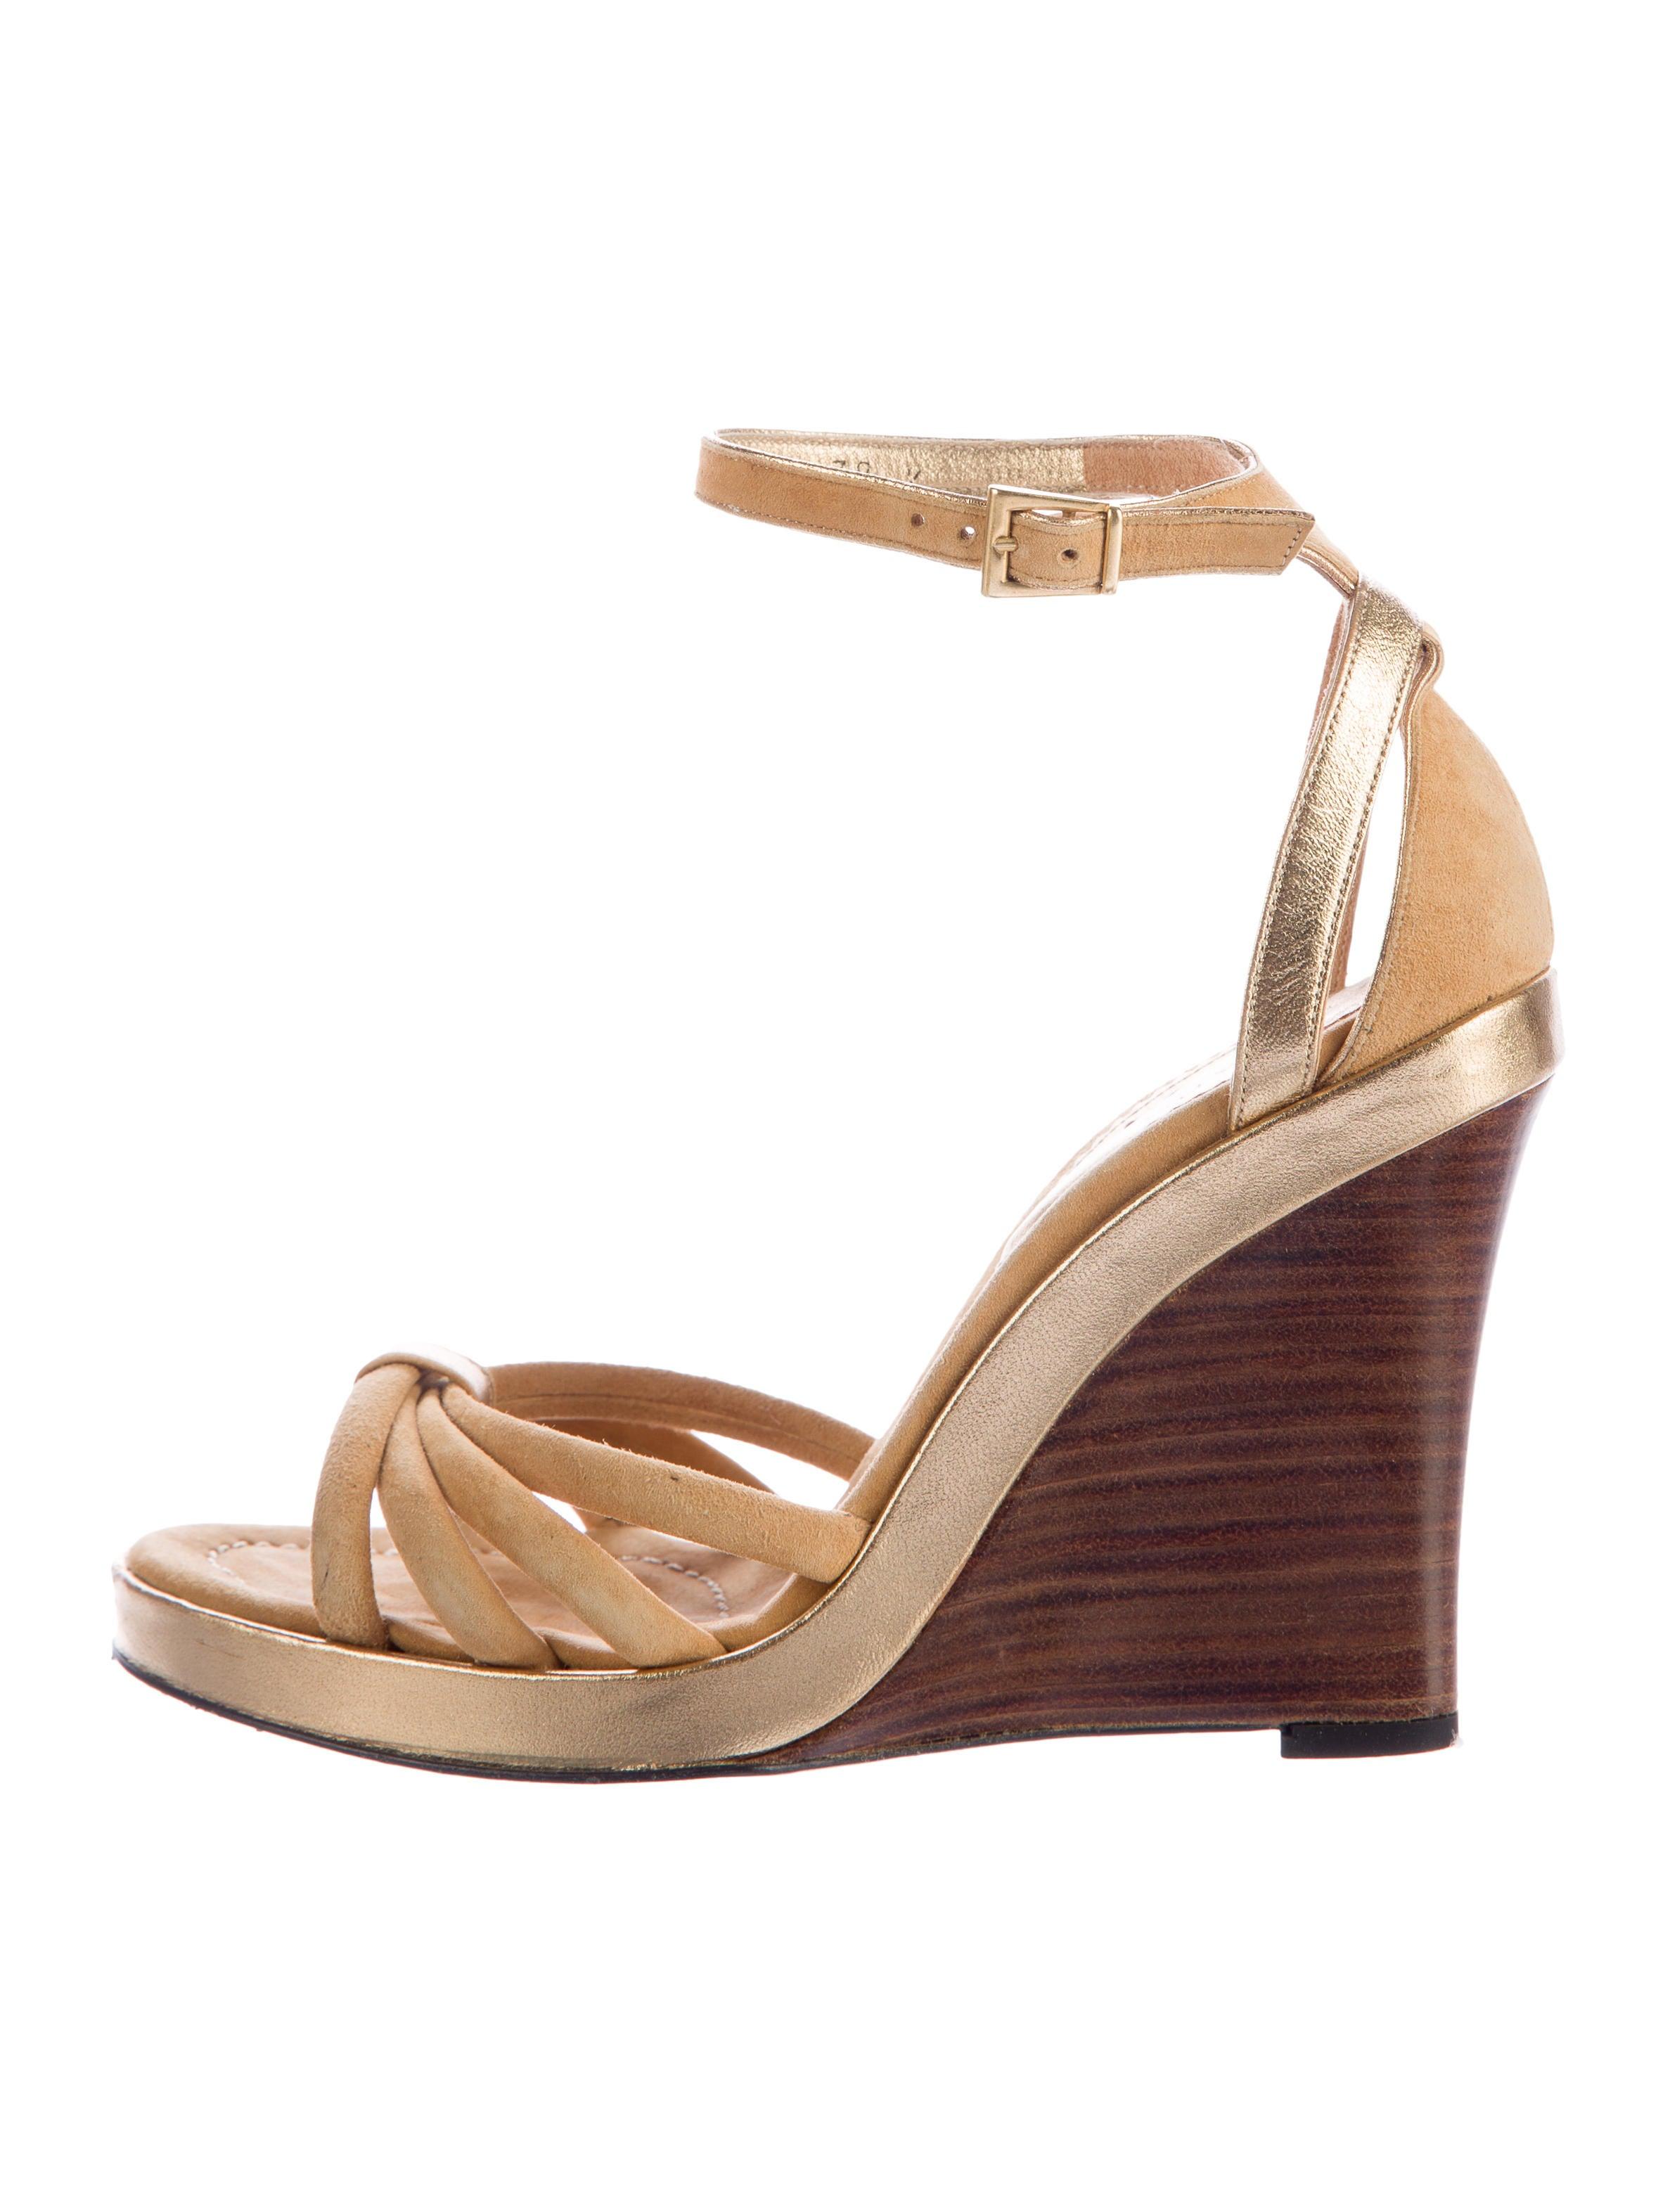 Barbara Bui Suede Wedge Sandalo scarpe RealReal BAB22699   The RealReal scarpe 49ec58